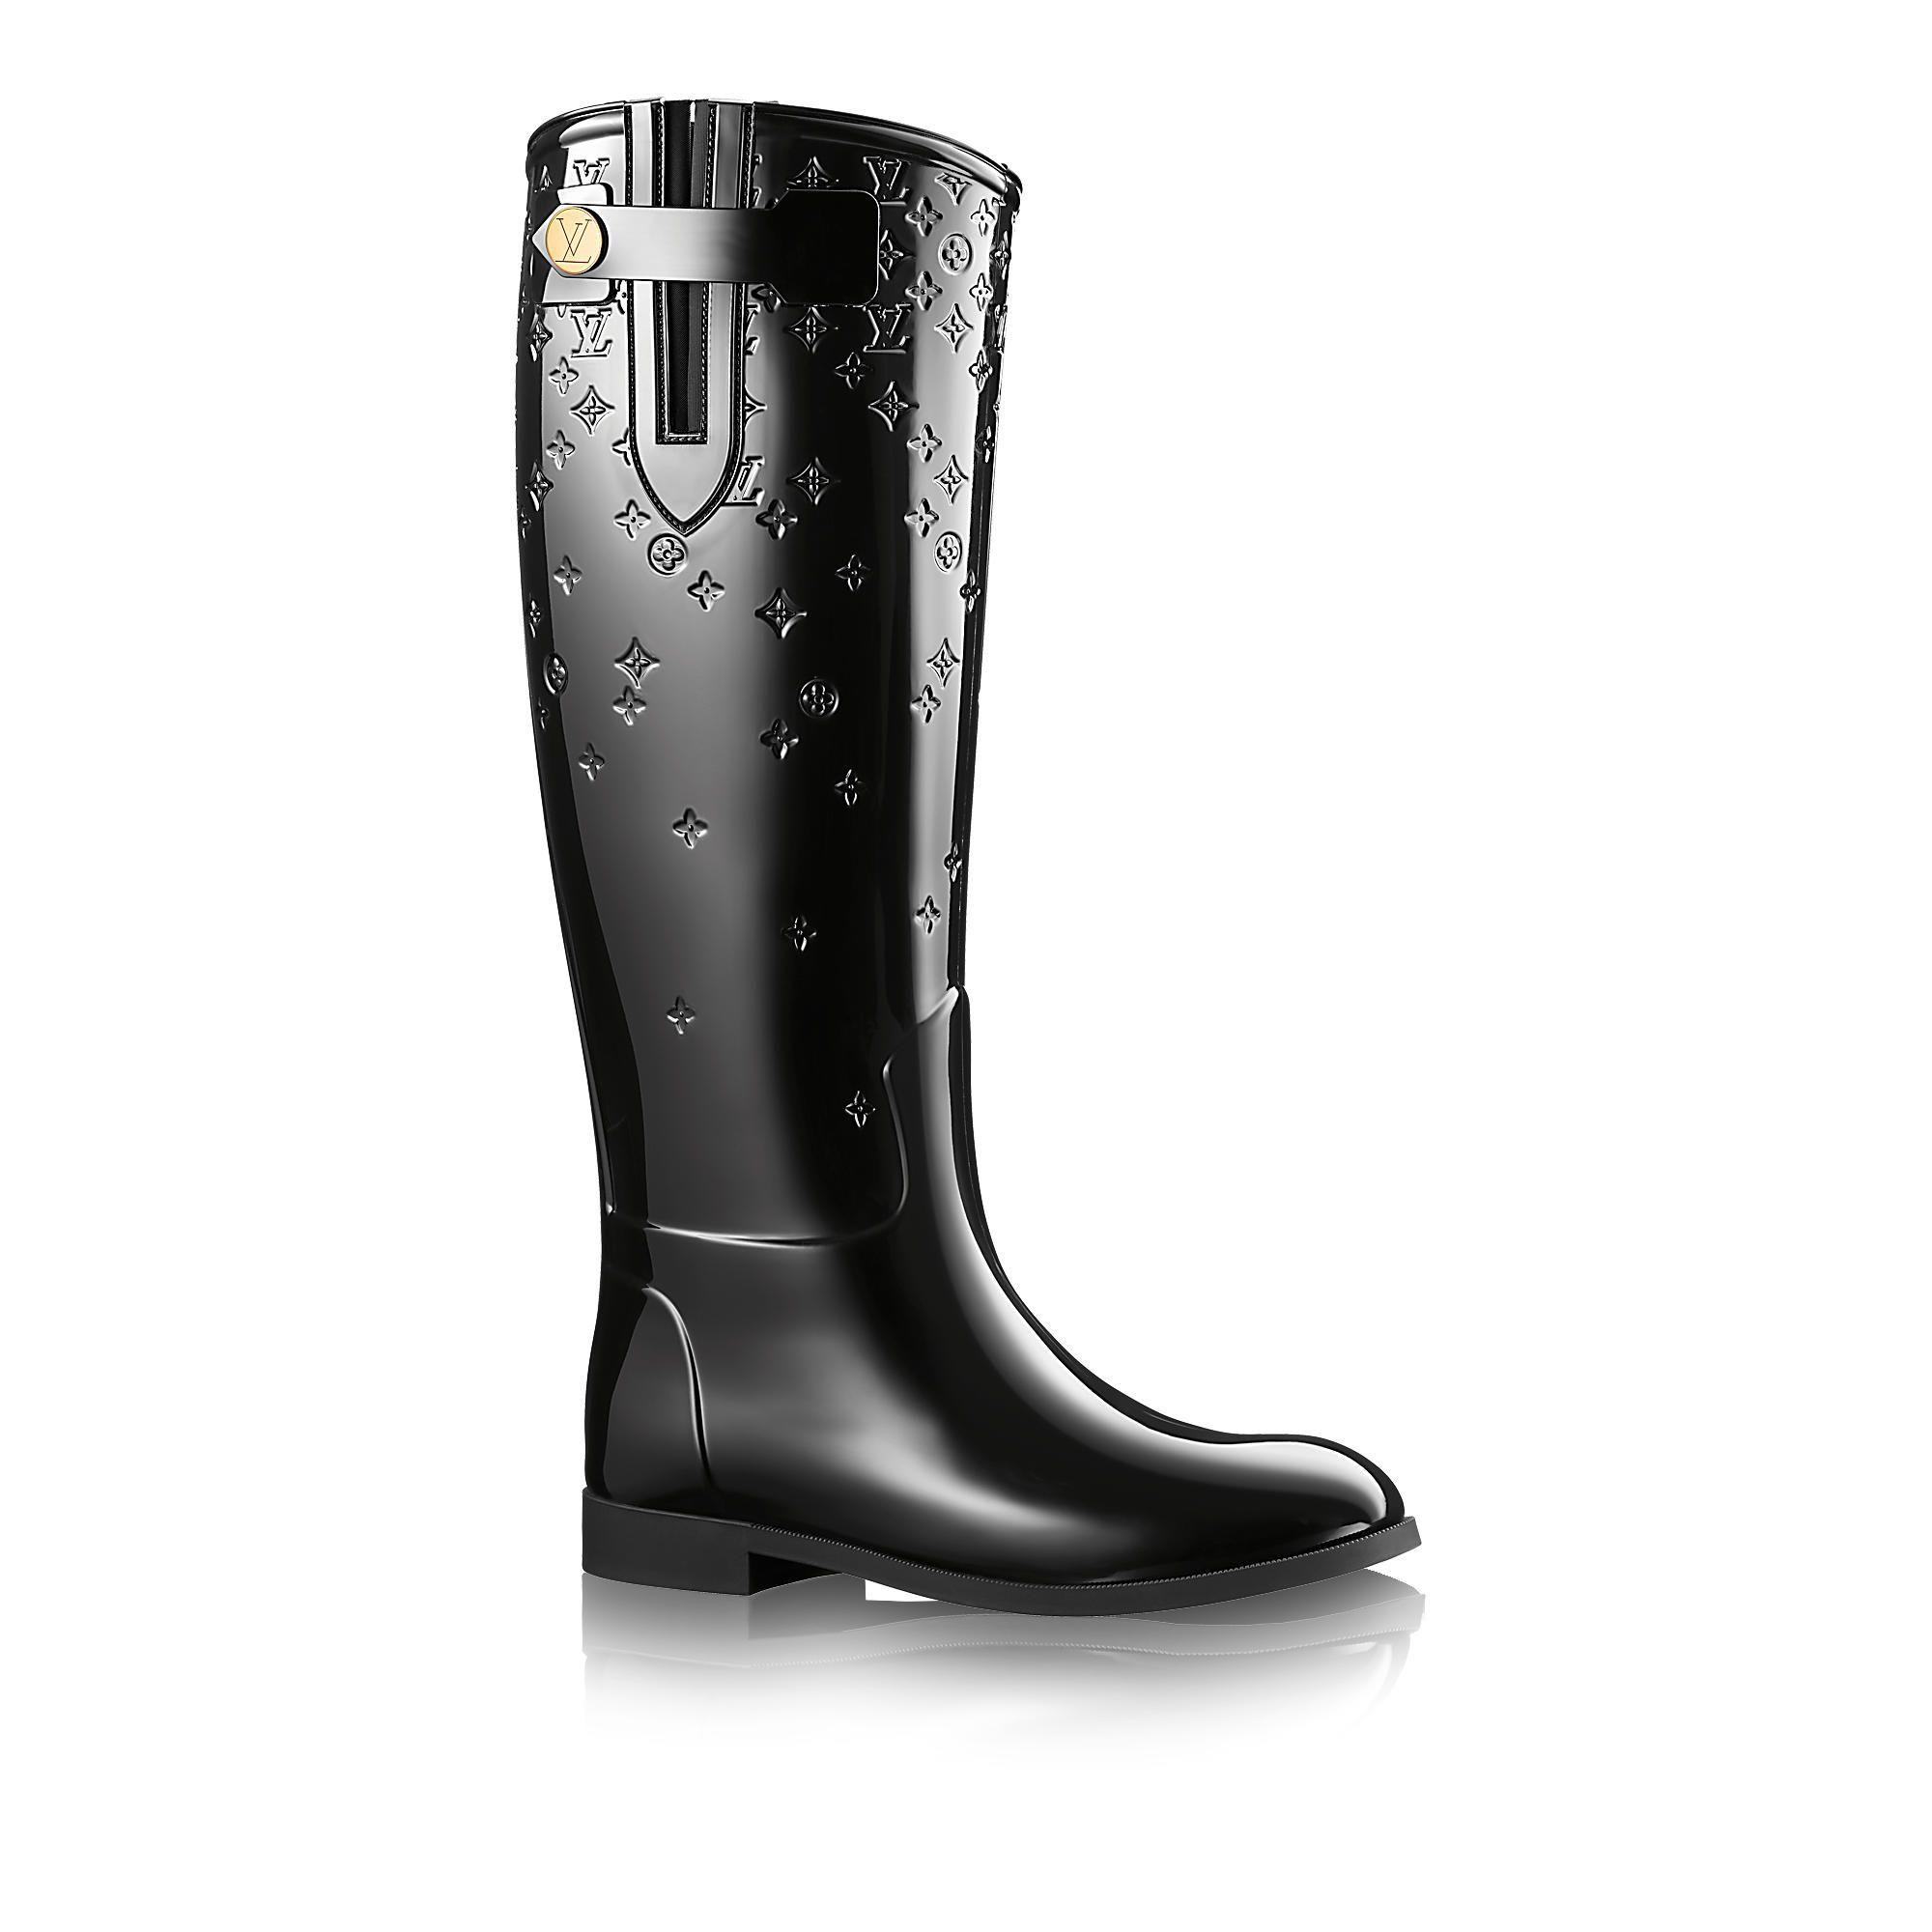 Louis vuitton rain boots